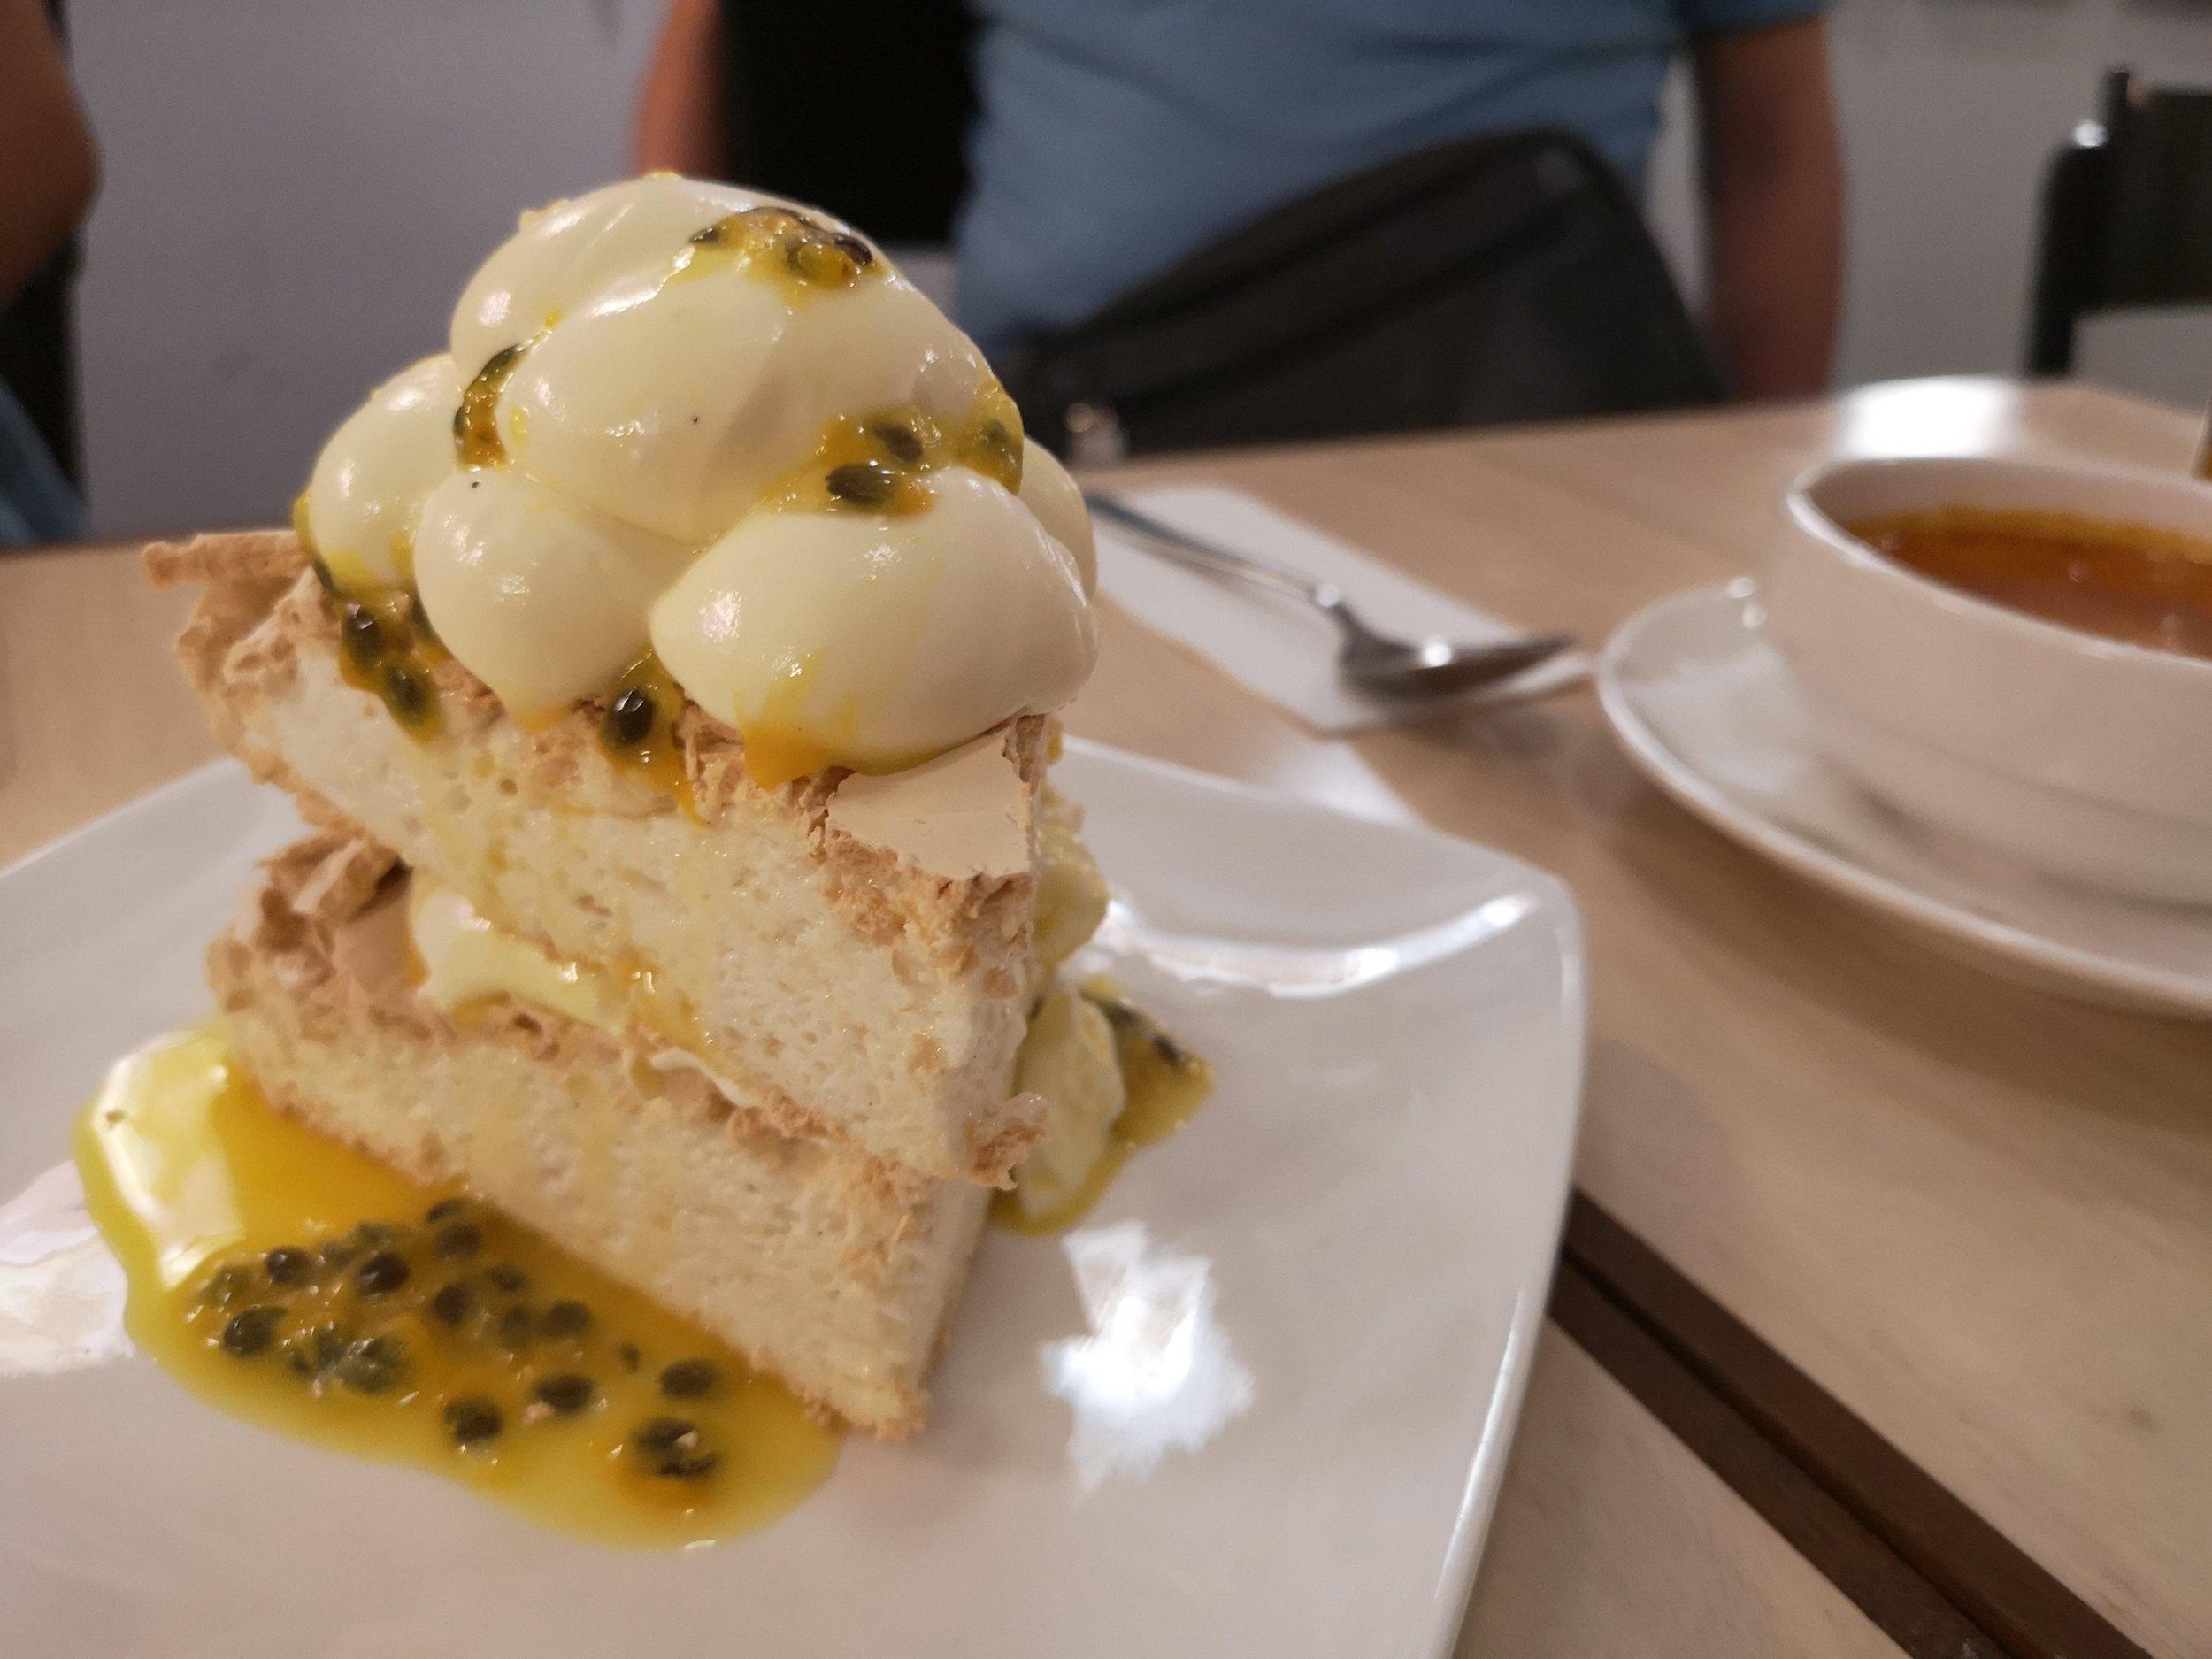 Passionfruit Pavlova with Lime Chantily Foo Foo